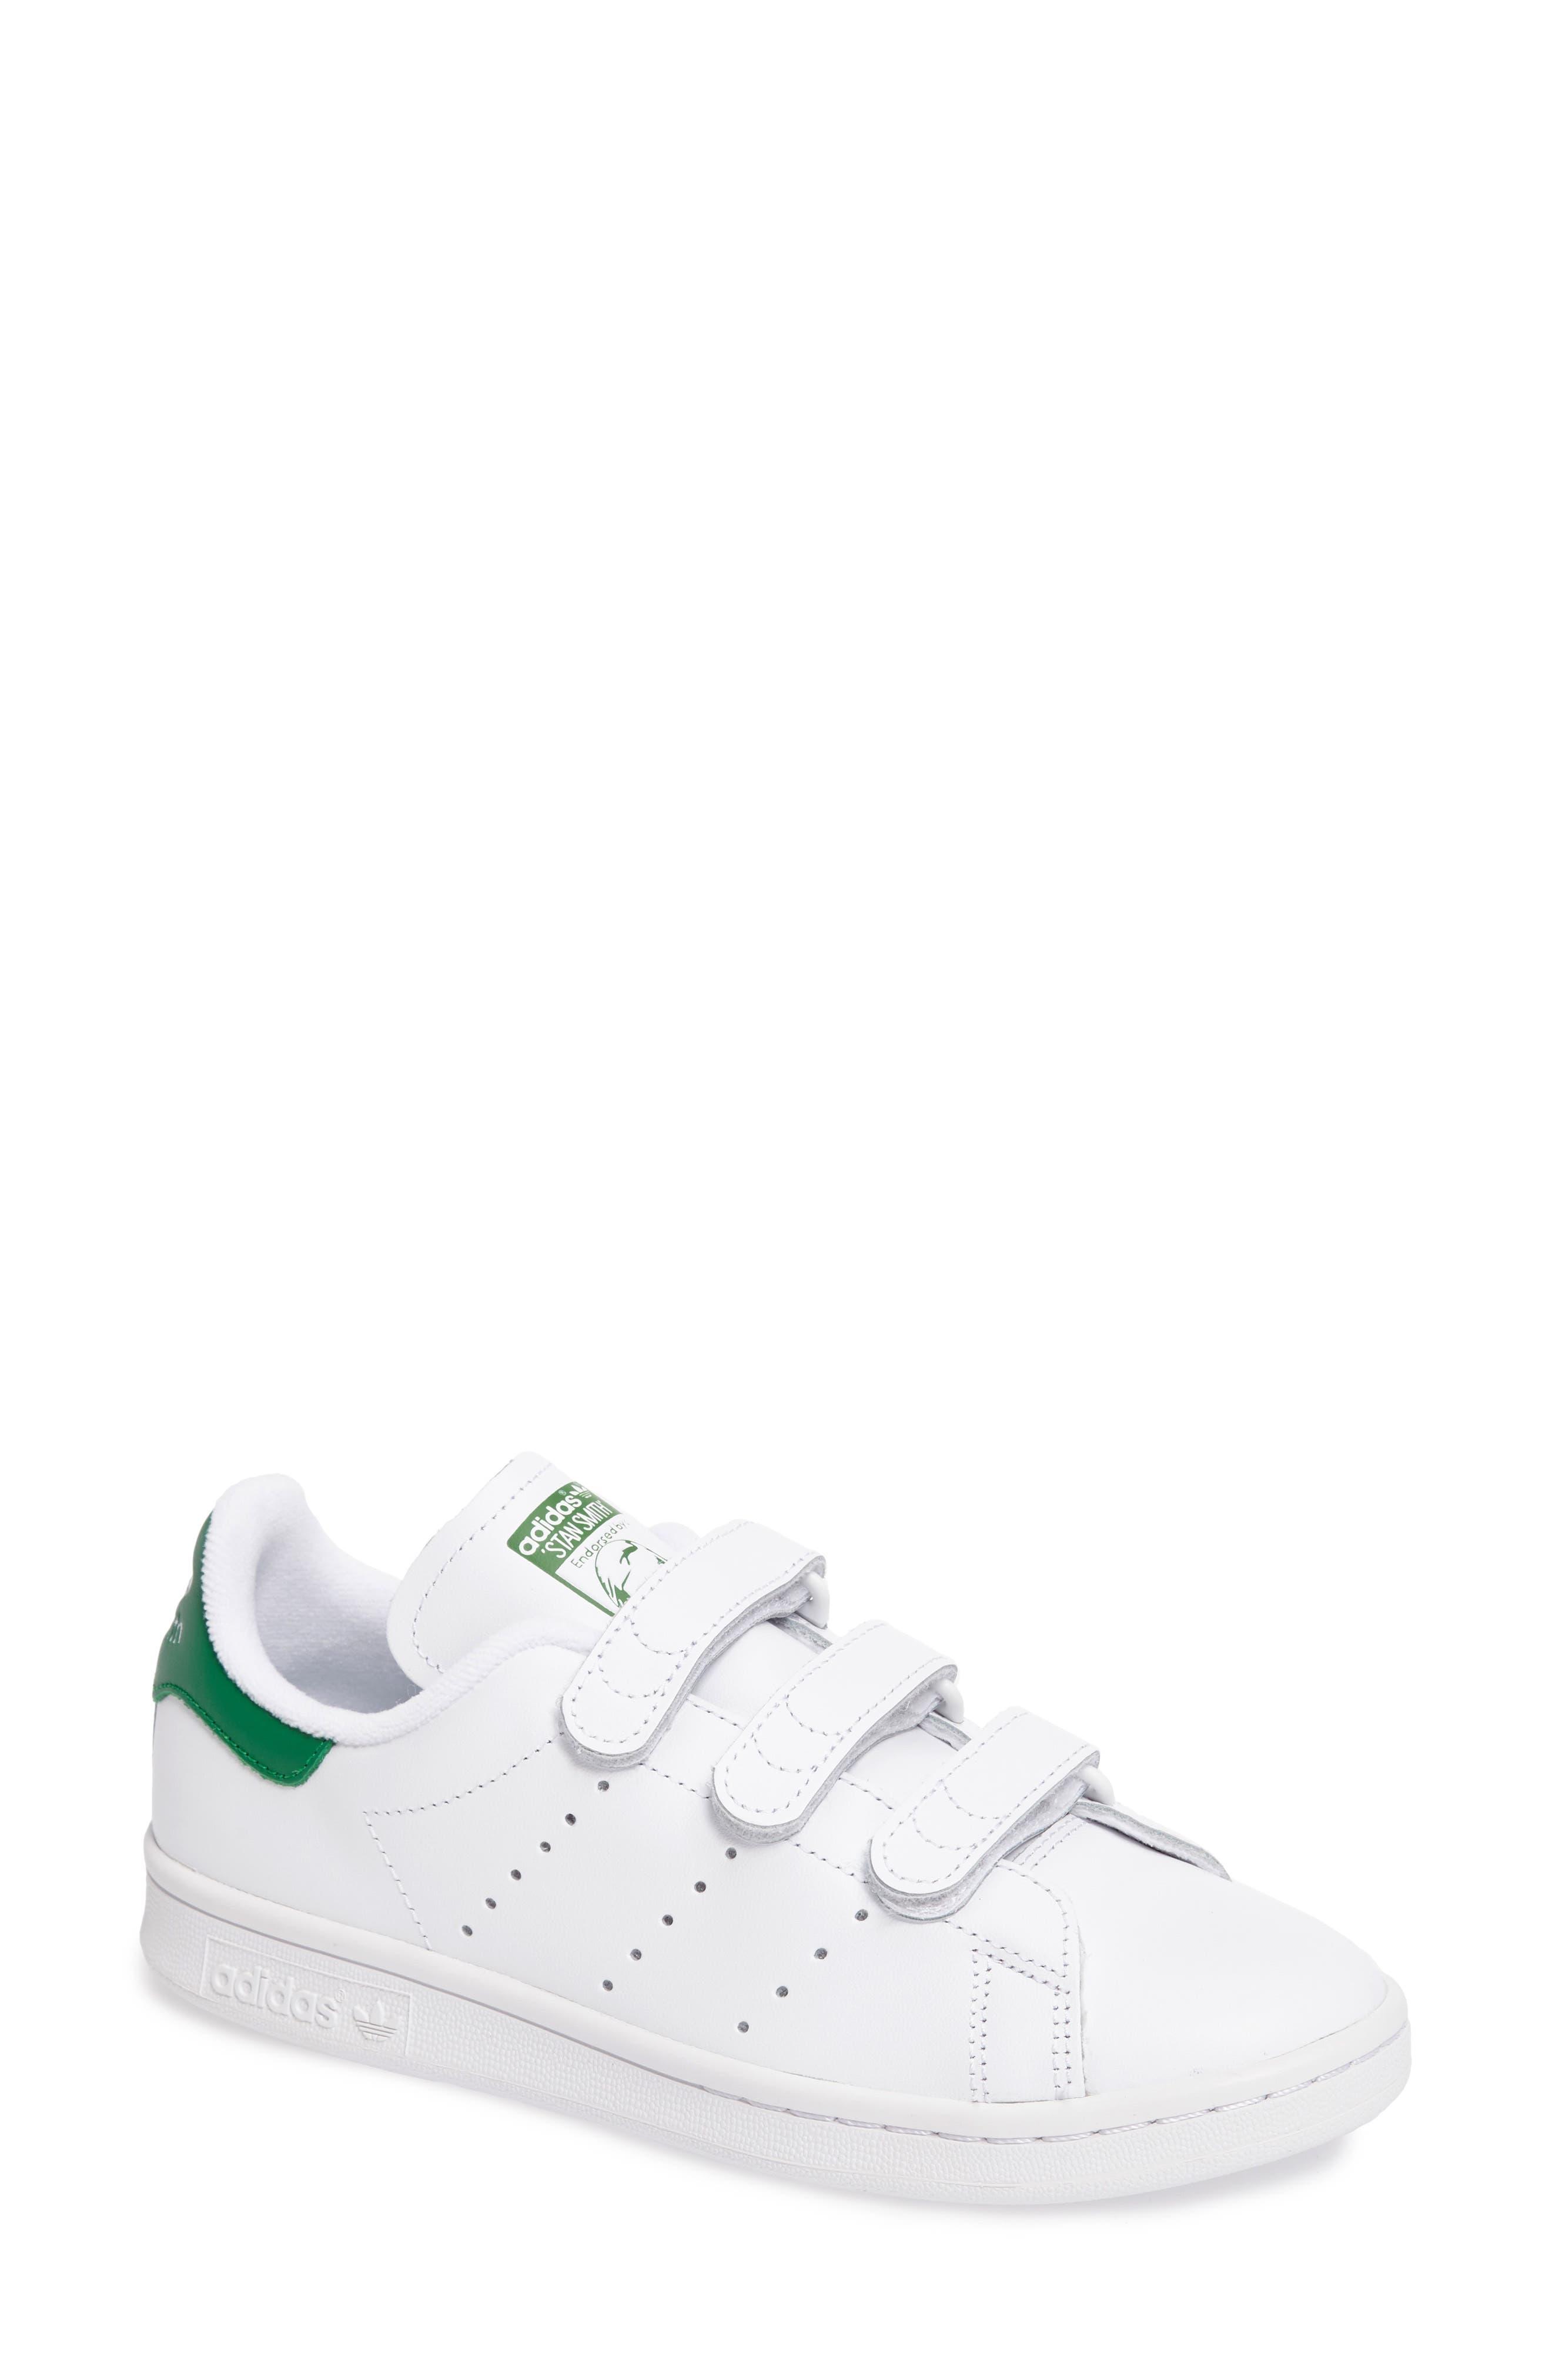 Main Image - adidas Stan Smith CF Sneaker (Women)